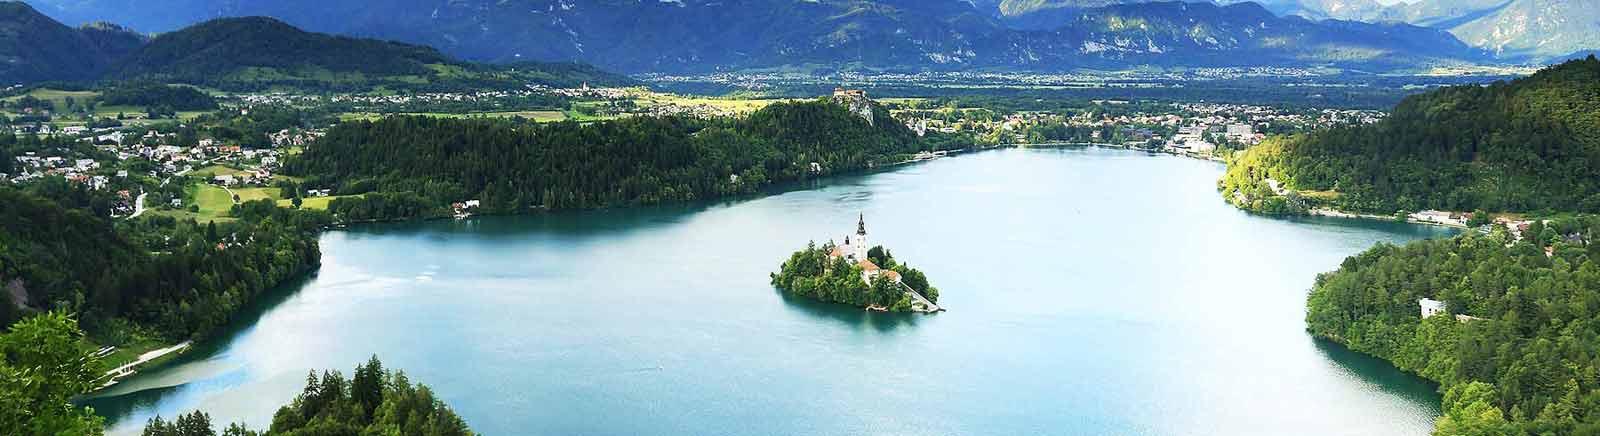 Blejsko jezero Slovenija